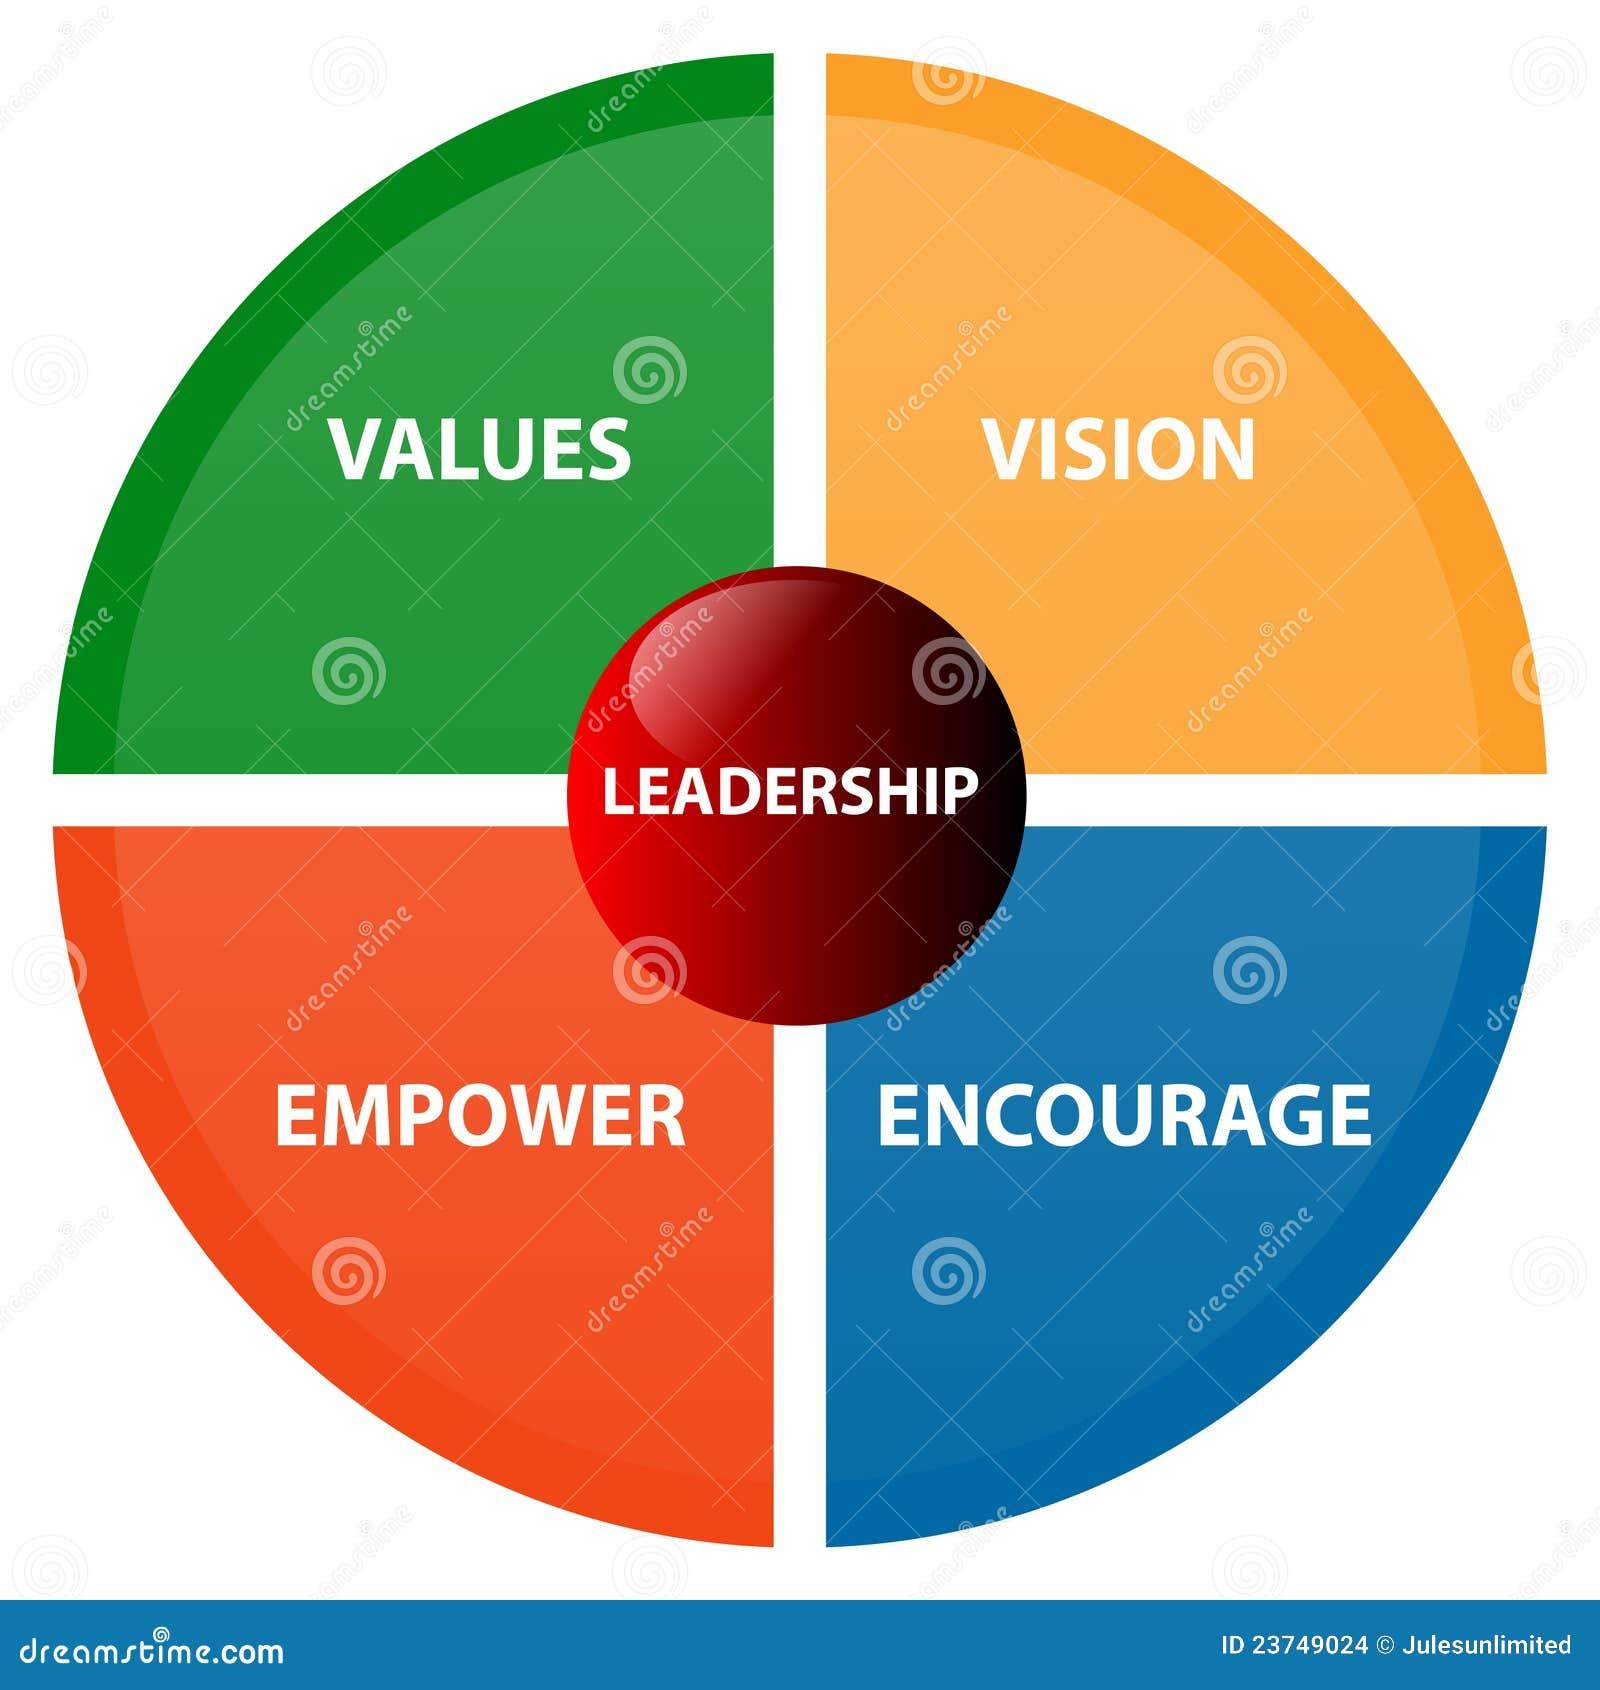 leadership in business: